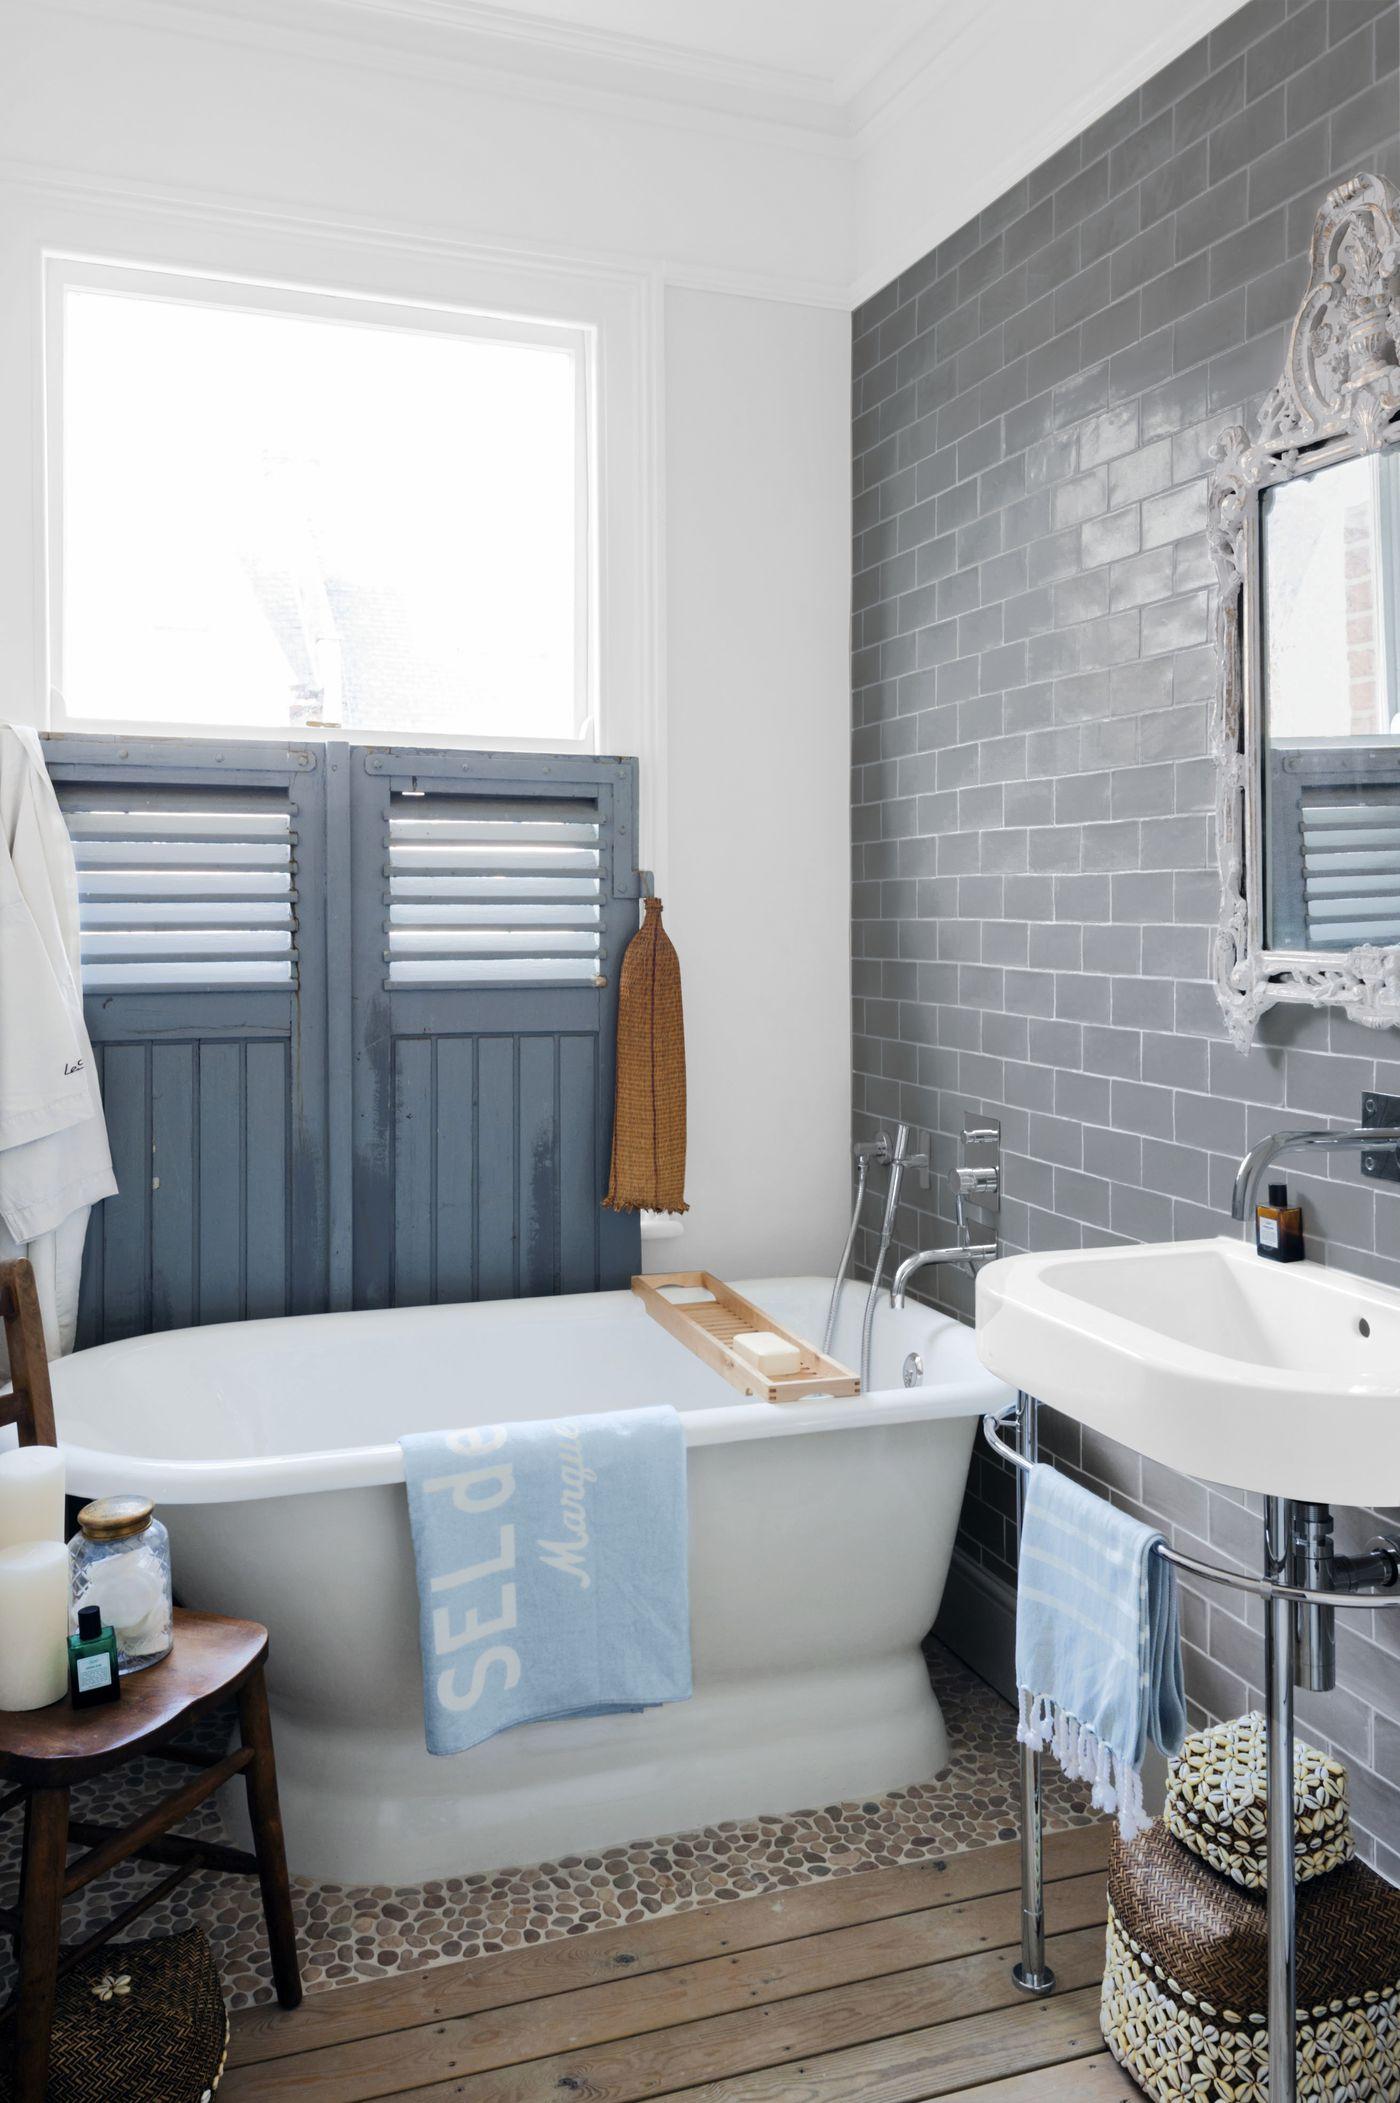 23 Budget-Friendly Bath Ideas - This Old House